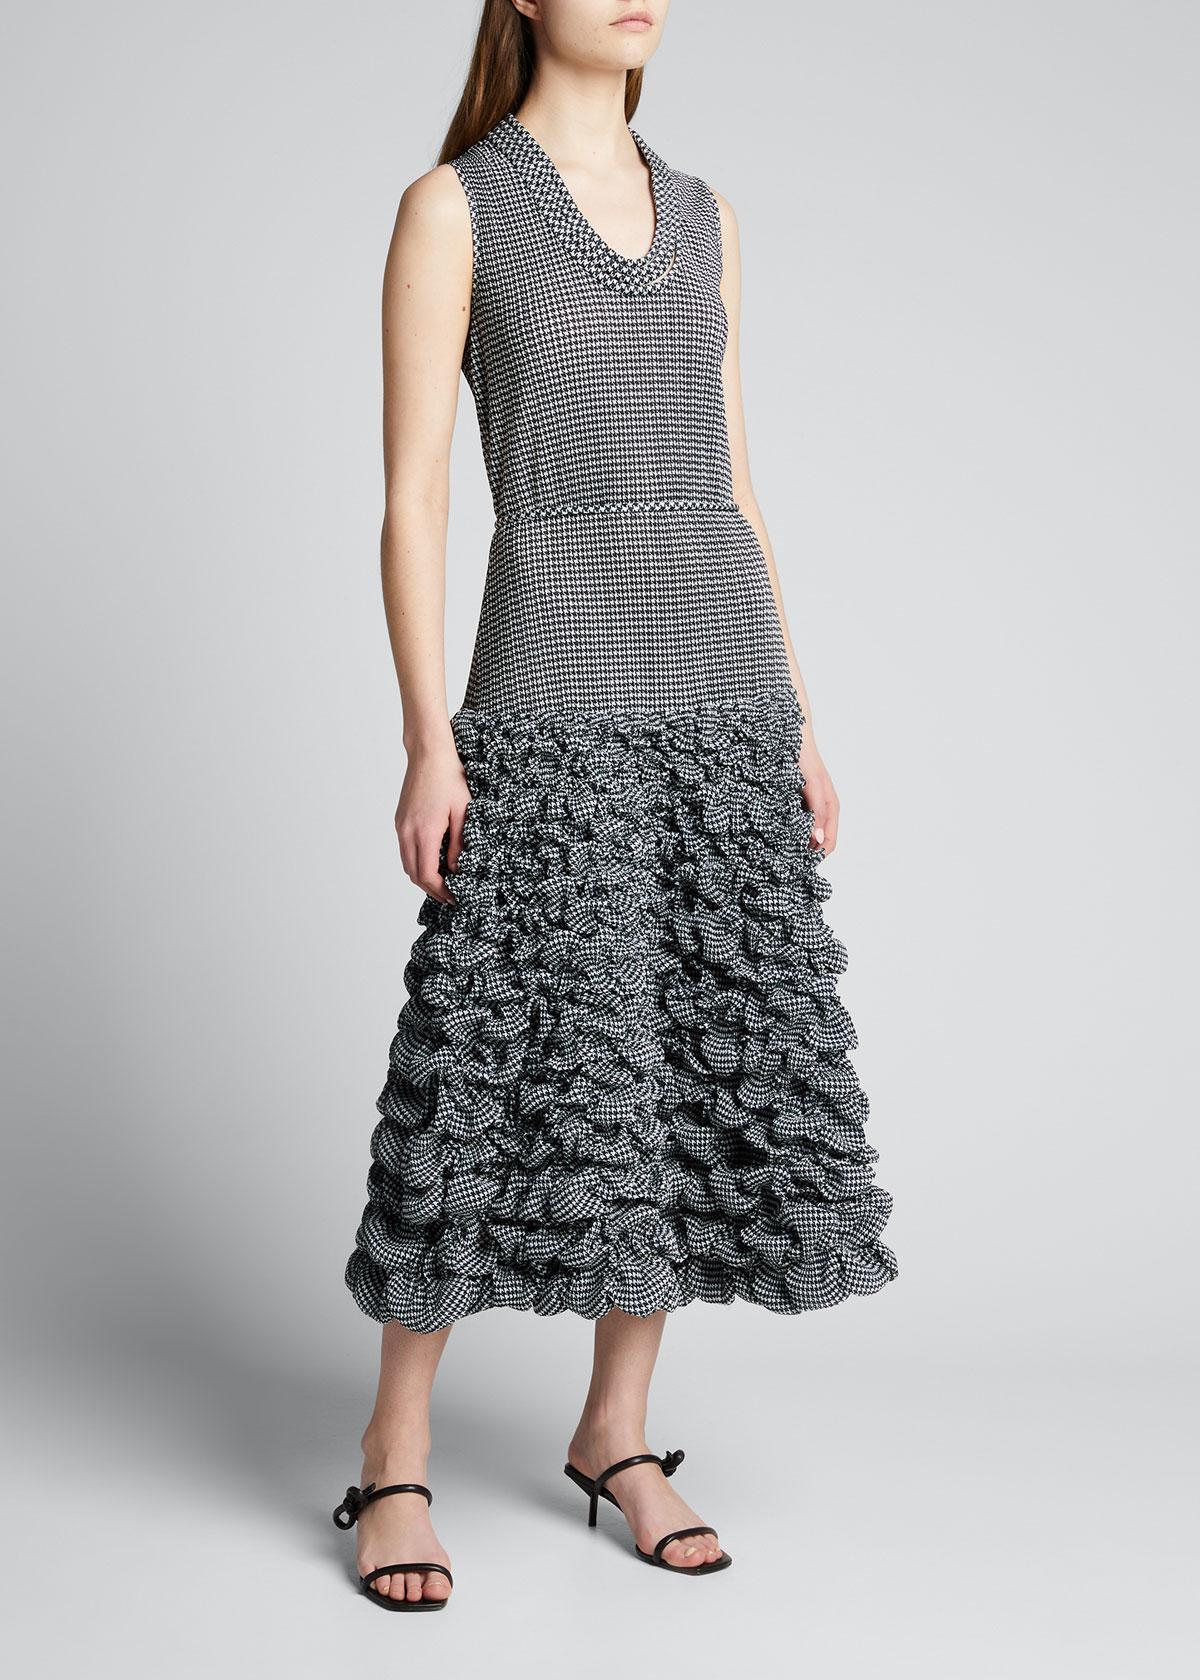 Giorgio Armani Dresses HOUNDSTOOTH PRINTED DROP-WAIST JERSEY DRESS